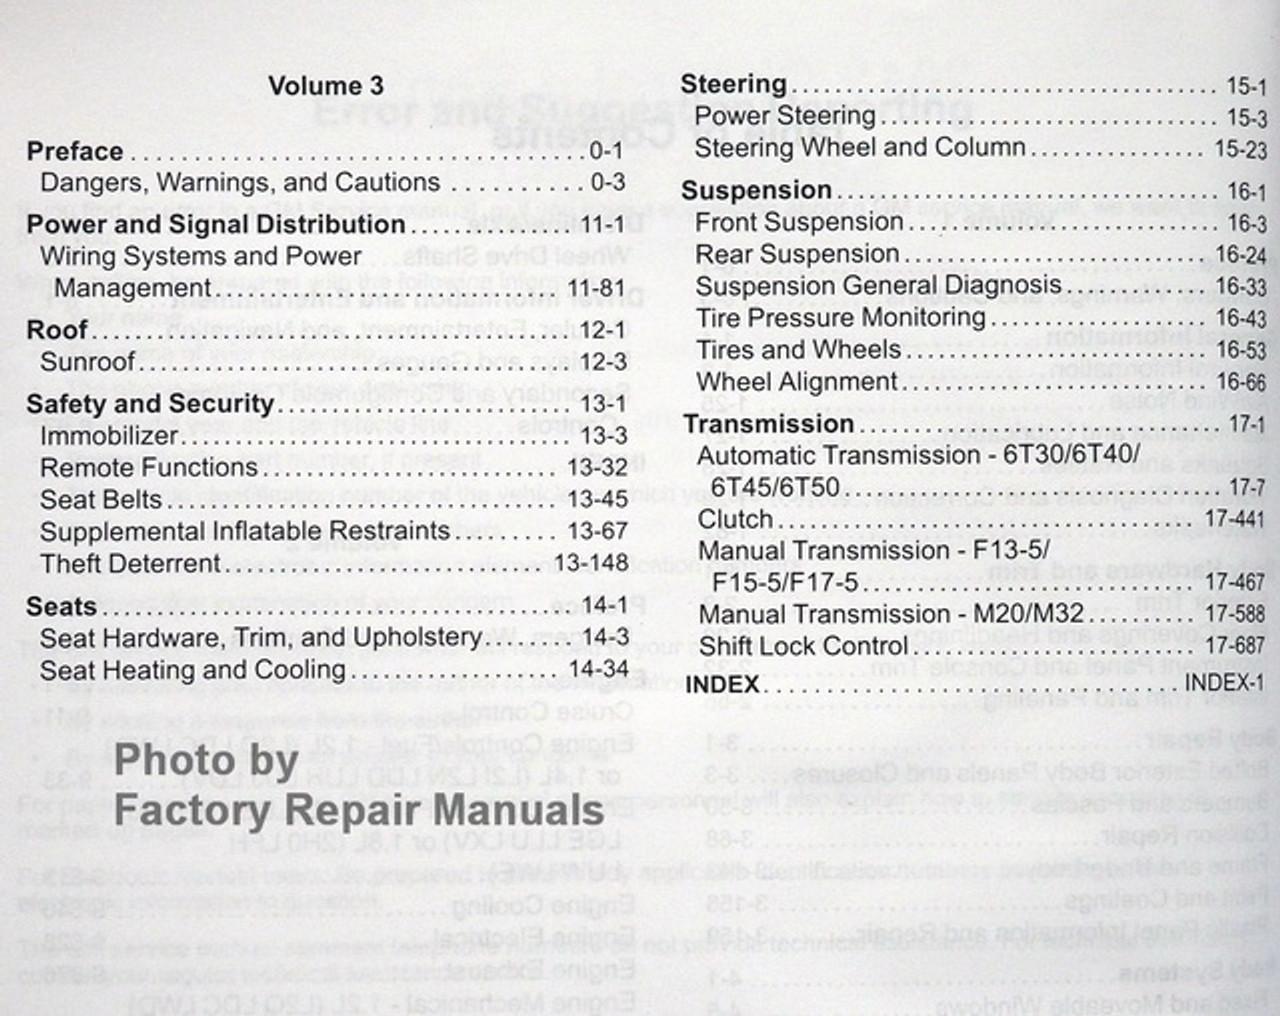 2012 Chevy Sonic Factory Service Manual Set Original Shop Repair